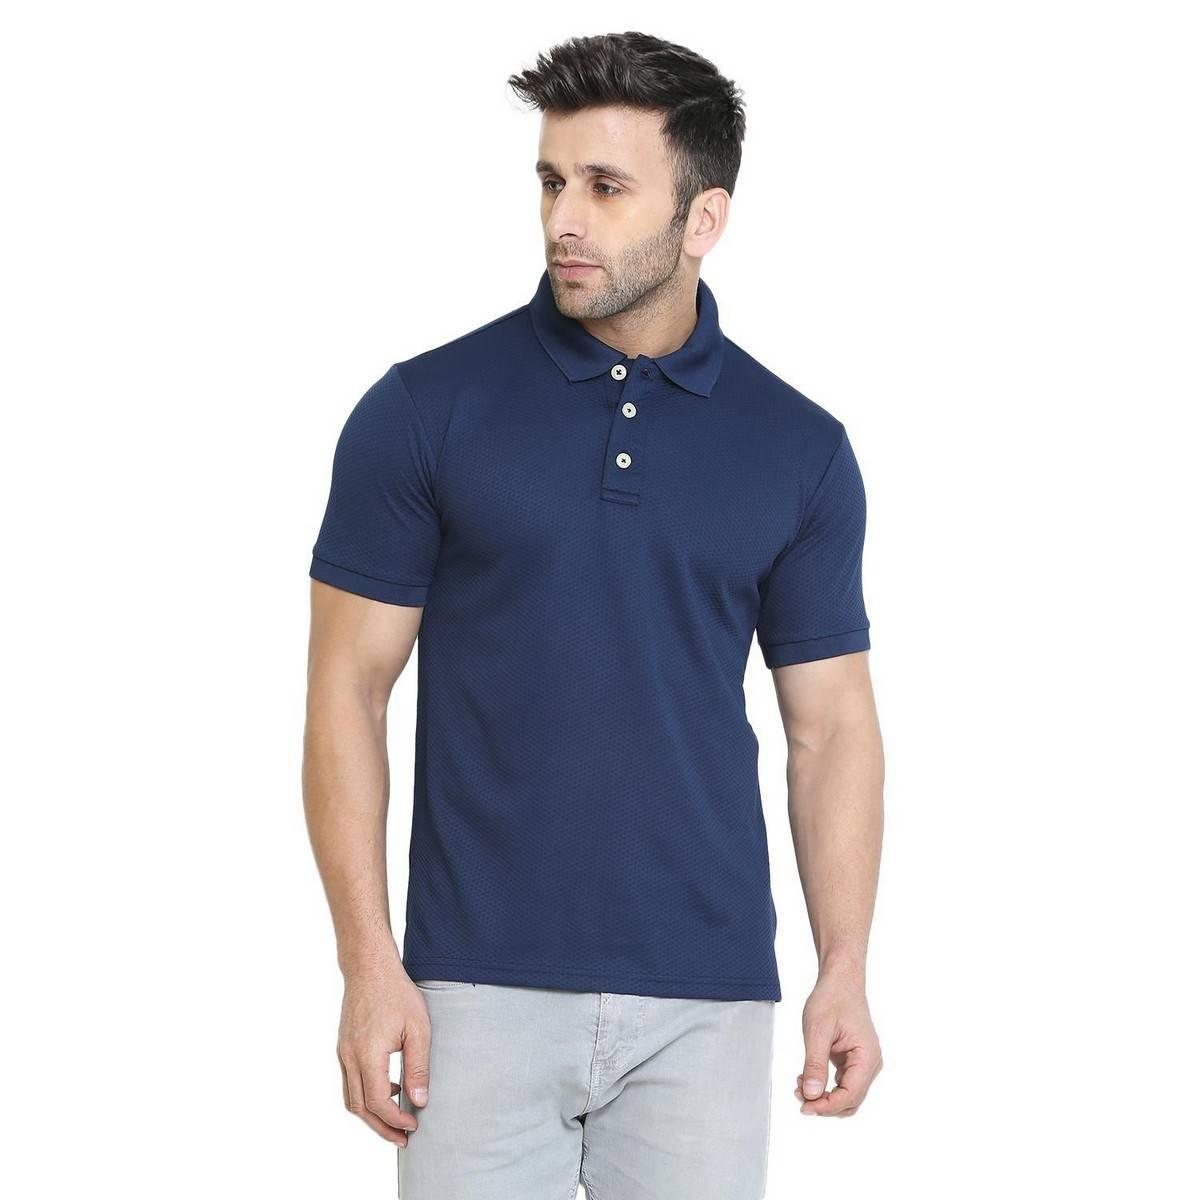 Paradise Zone Half Sleeves Plain Polo Navy Blue Tshirt For Men